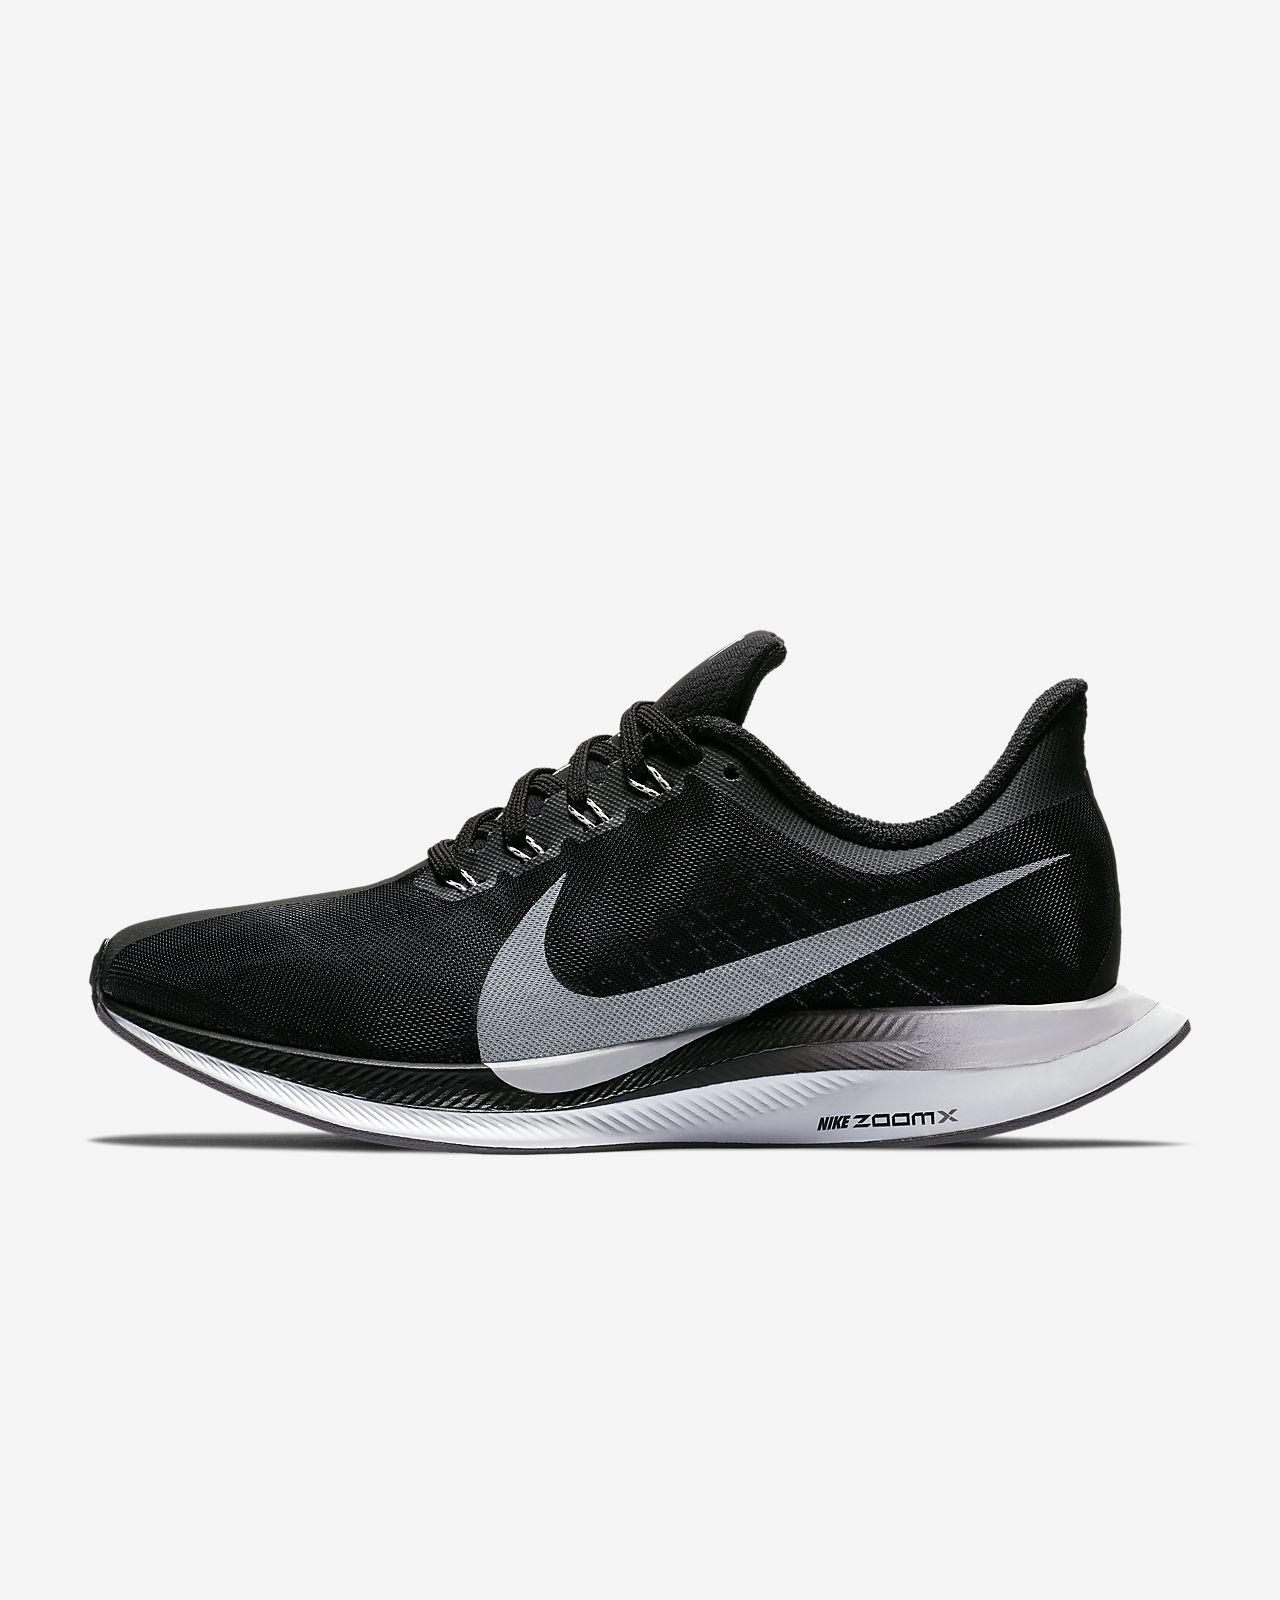 Donna Pegasus Nike Zoom Running Scarpa Ch Da Turbo xFaPYxnqw